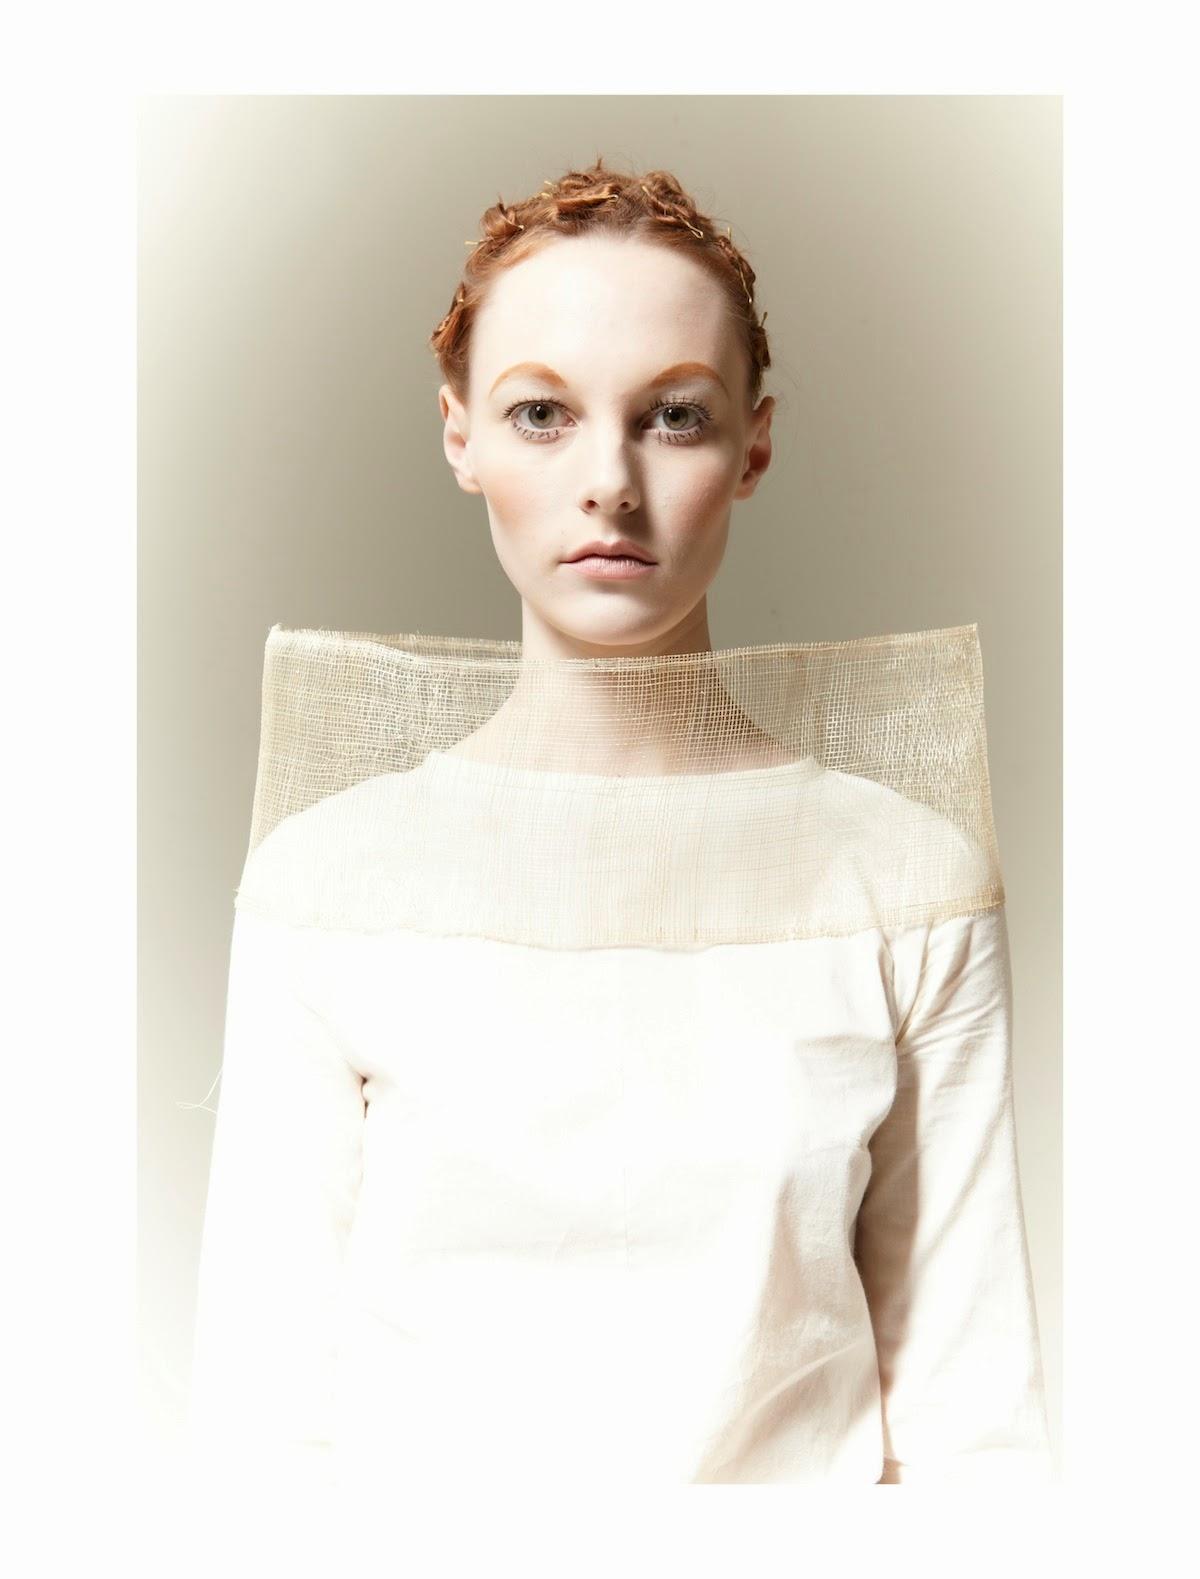 Pale Beauty Portrait Of Blond Woman Stock Image: On Set Management: Blasse Schönheit